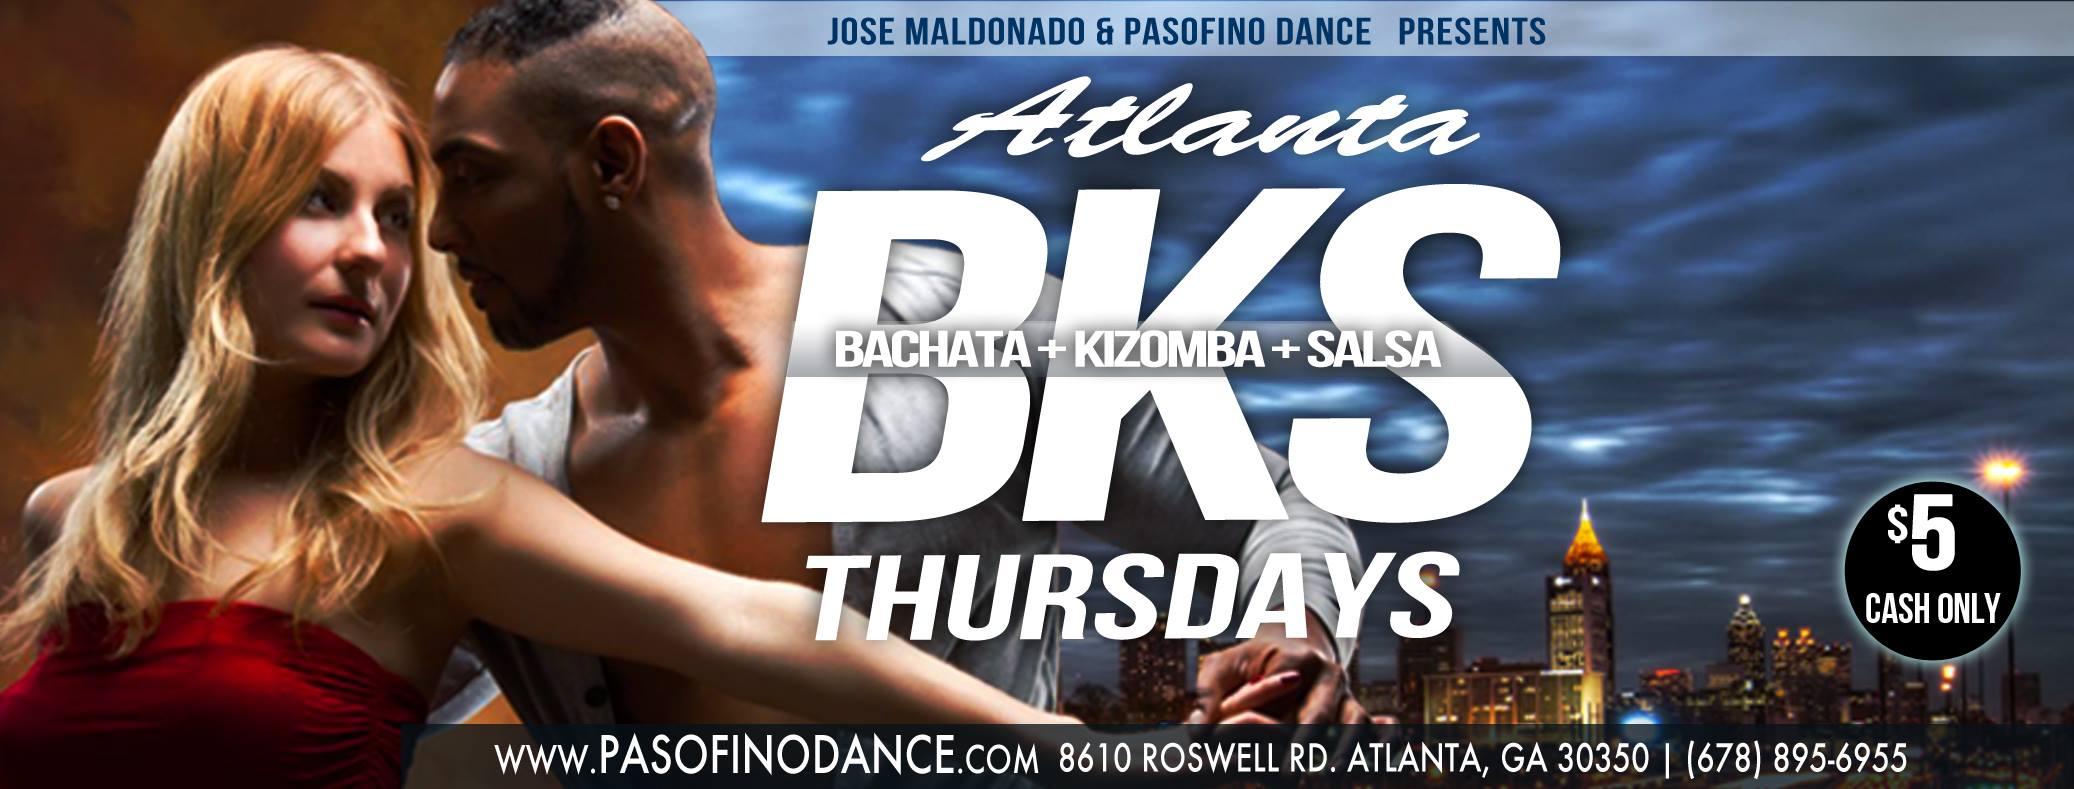 Salsa Thursdays at PasoFino